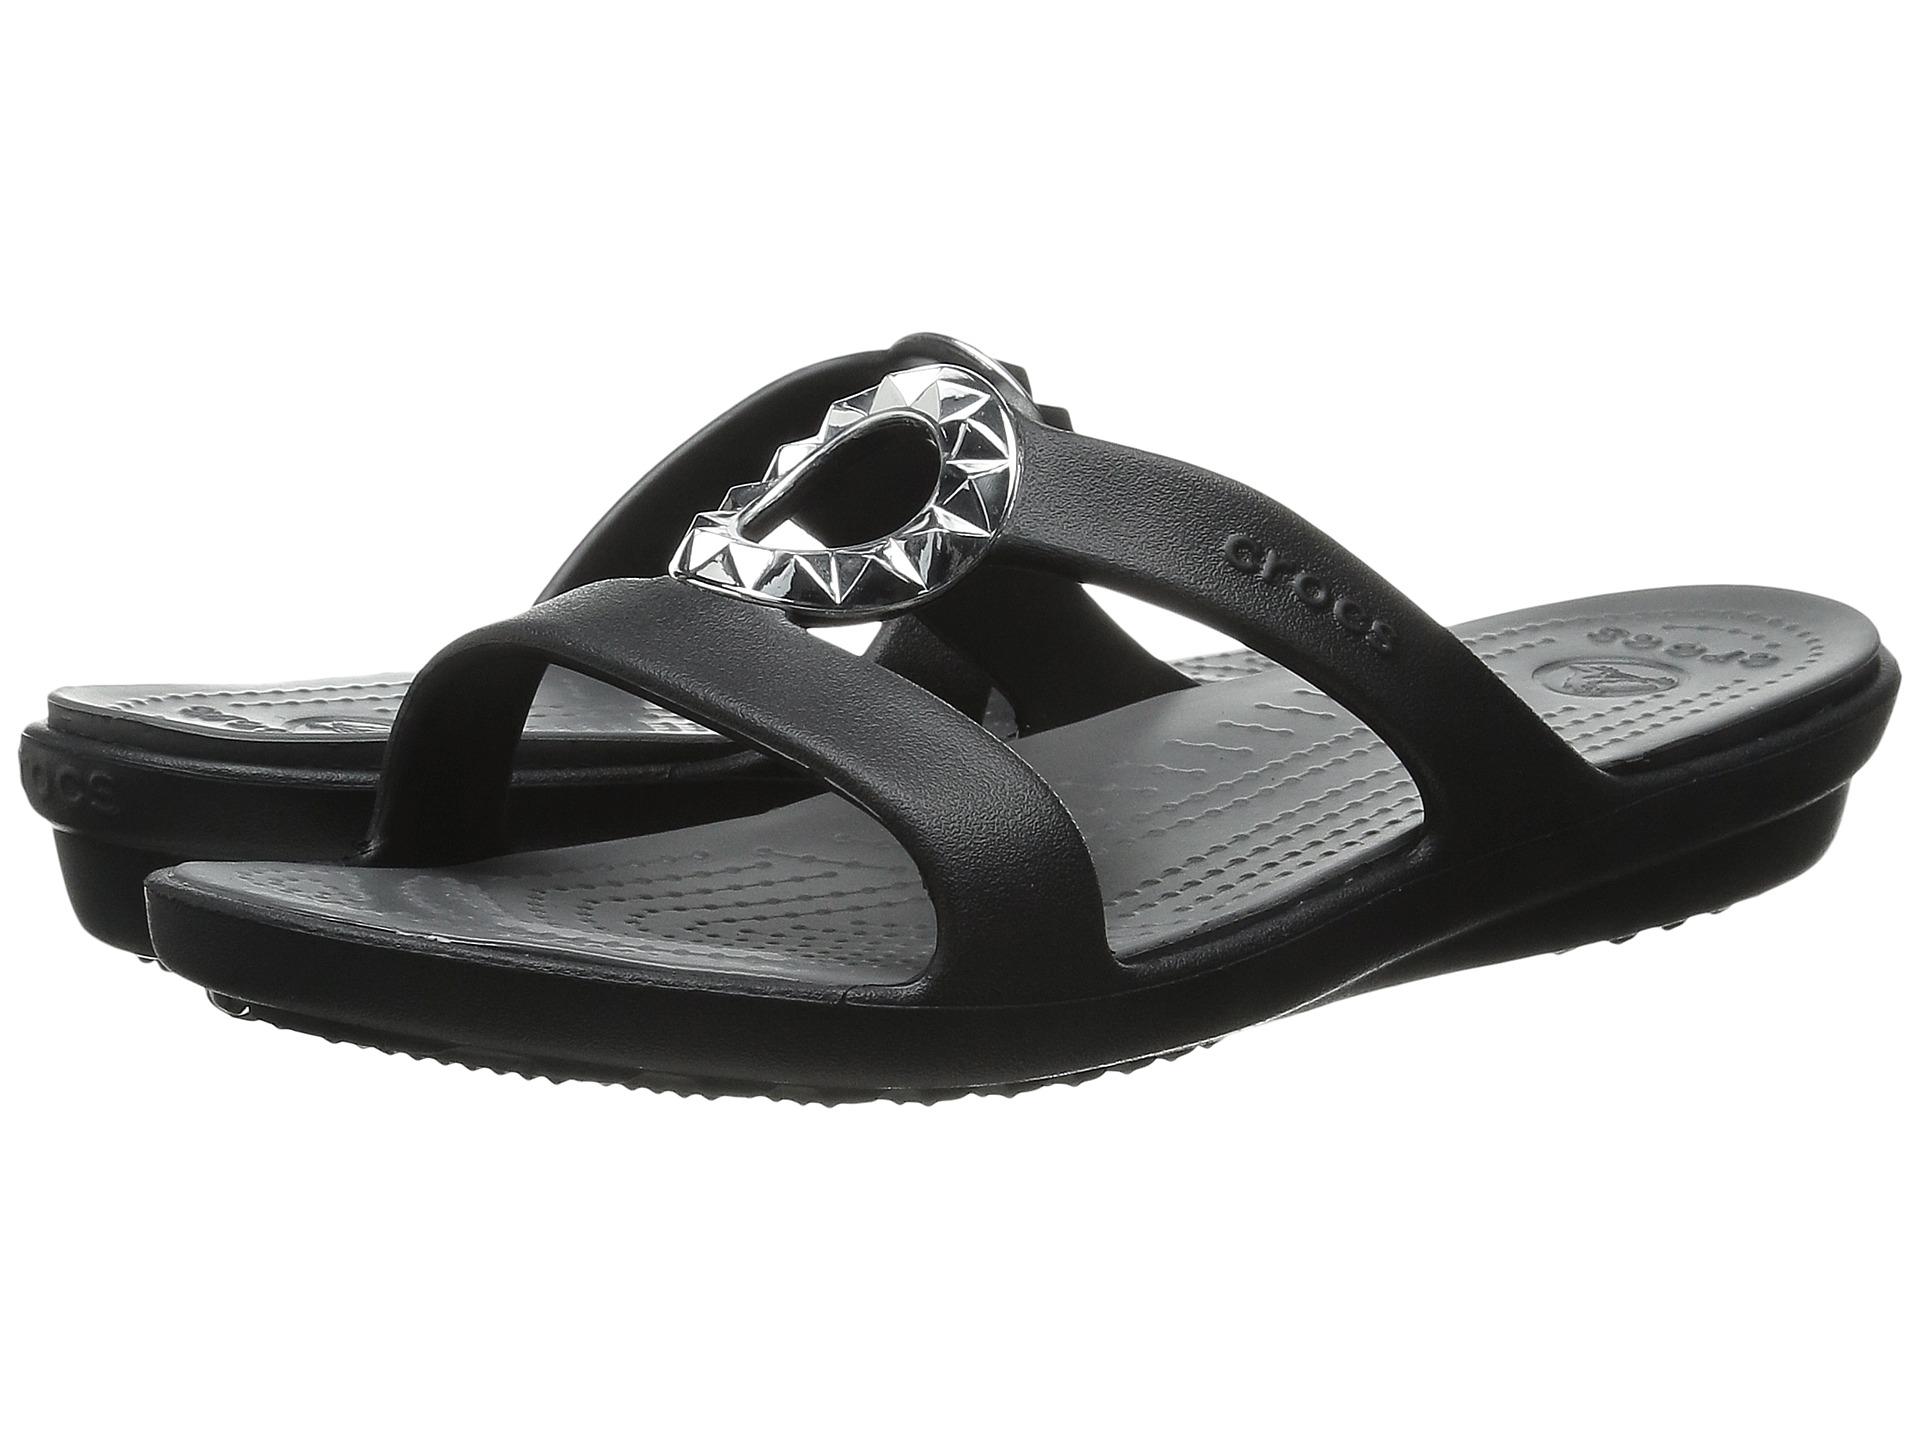 Crocs Sanrah Studded Circle Sandal BlackGraphite Zapposcom Free